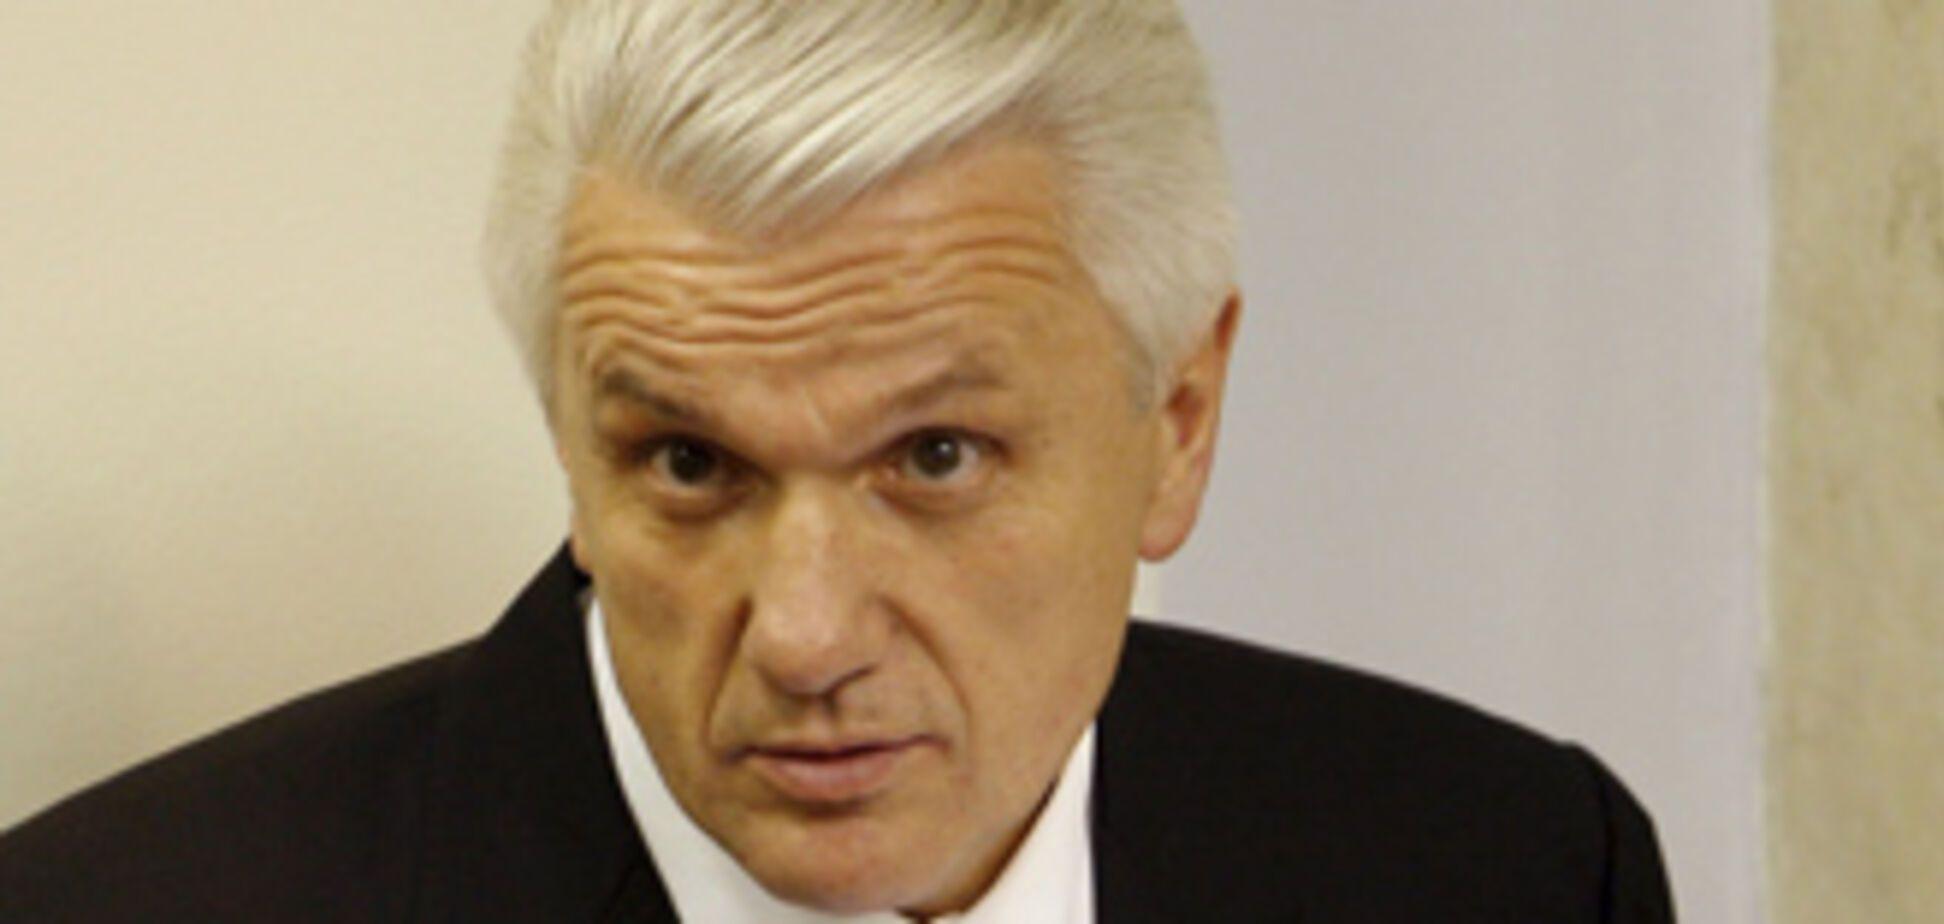 Литвин: Європа не стане глобальним гравцем без України